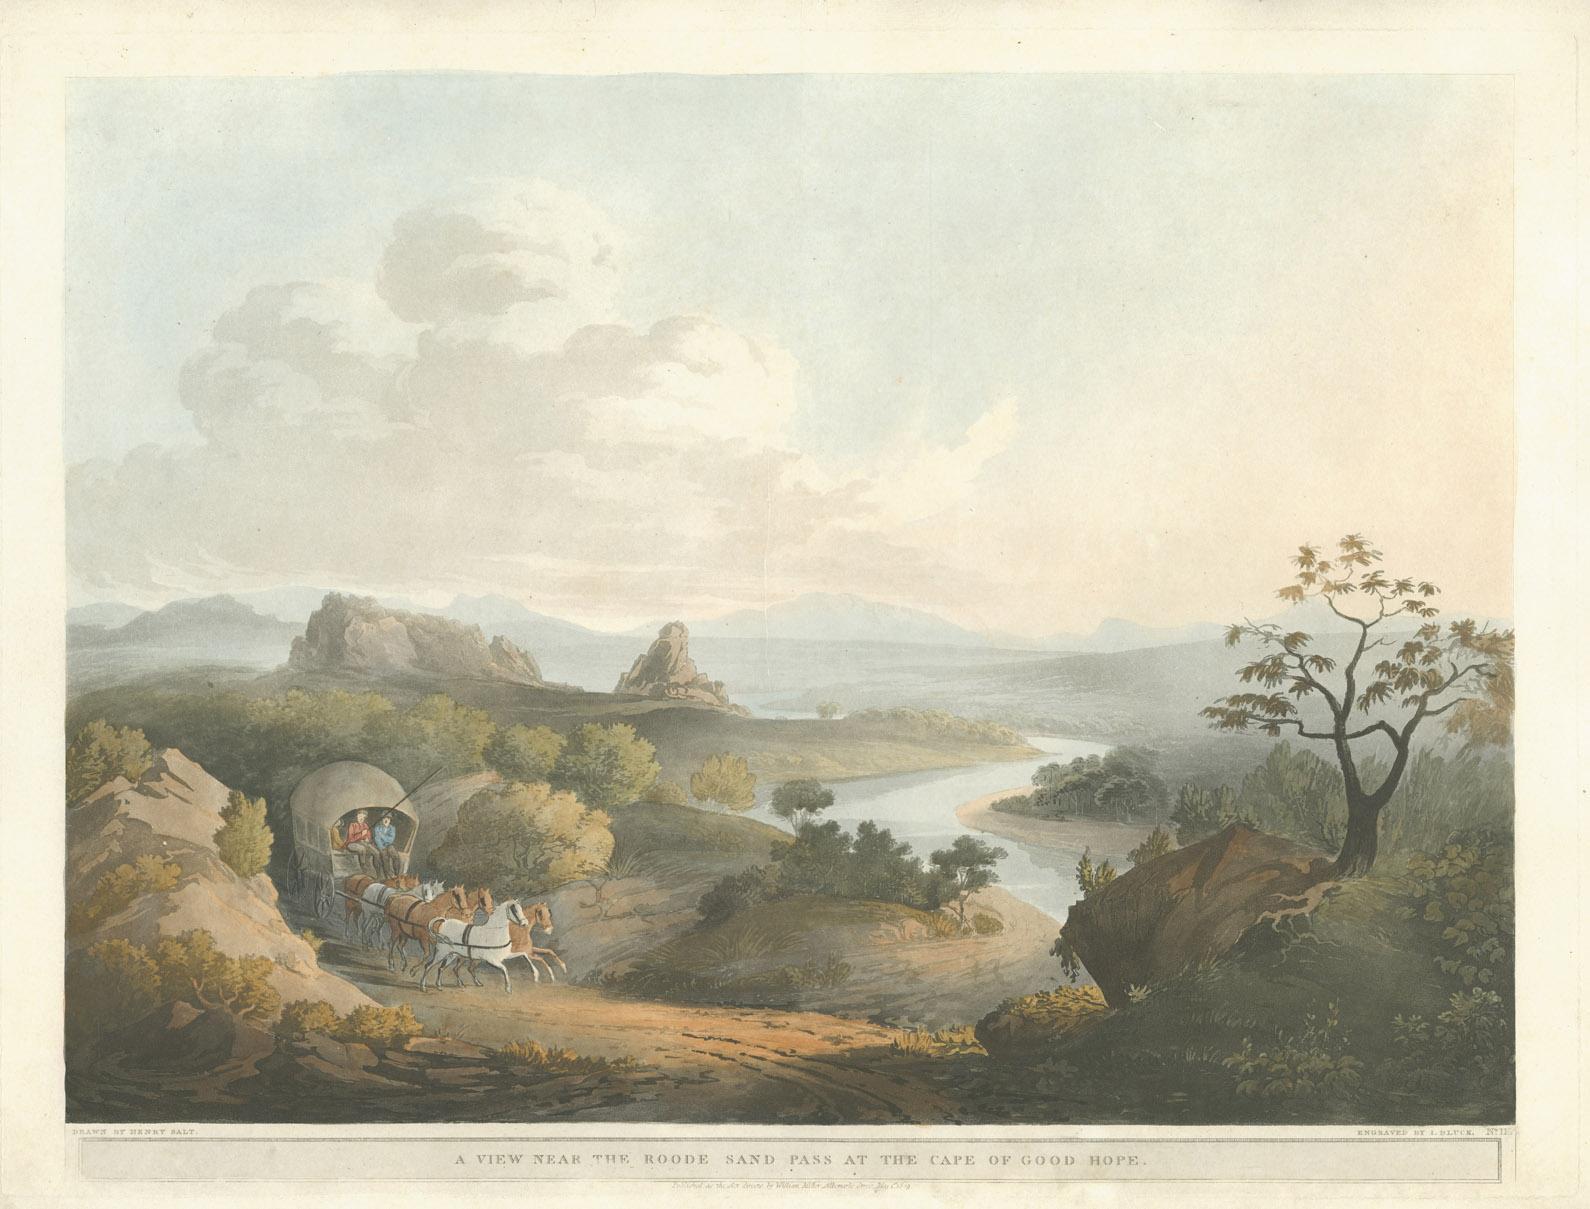 Henry Salt Roodezand pass 1809